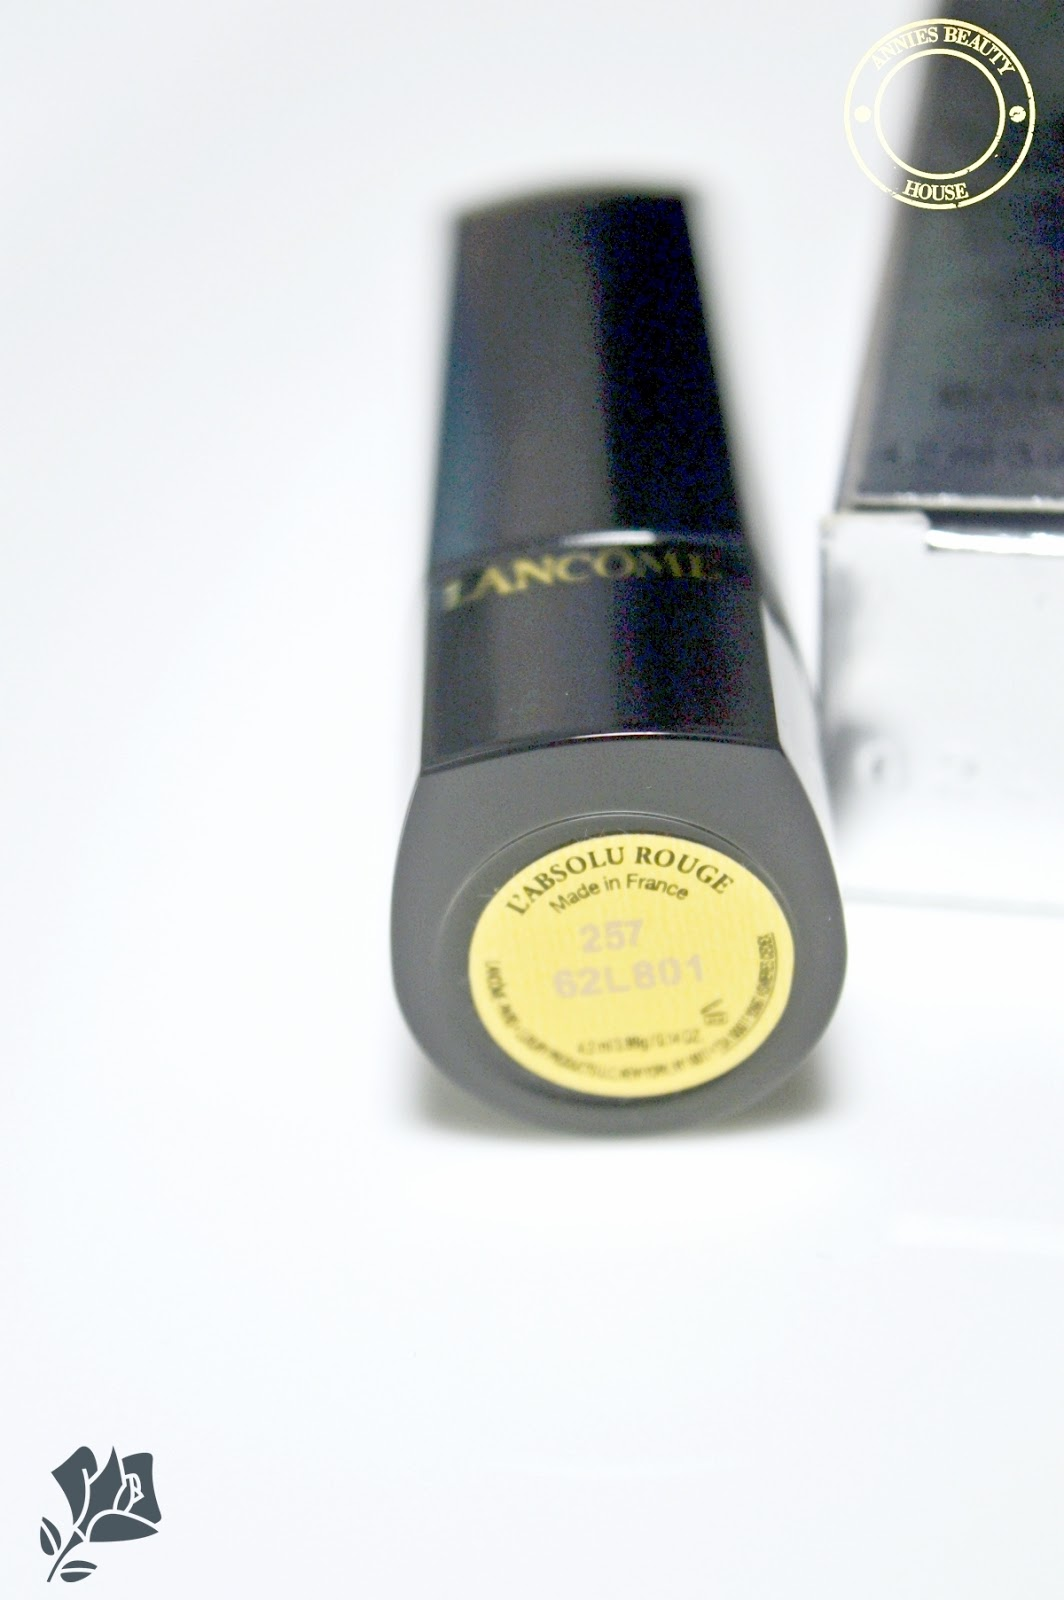 LANCÔME L'Absolu Rouge Rose Bourbon 257 - Lipstick and Color